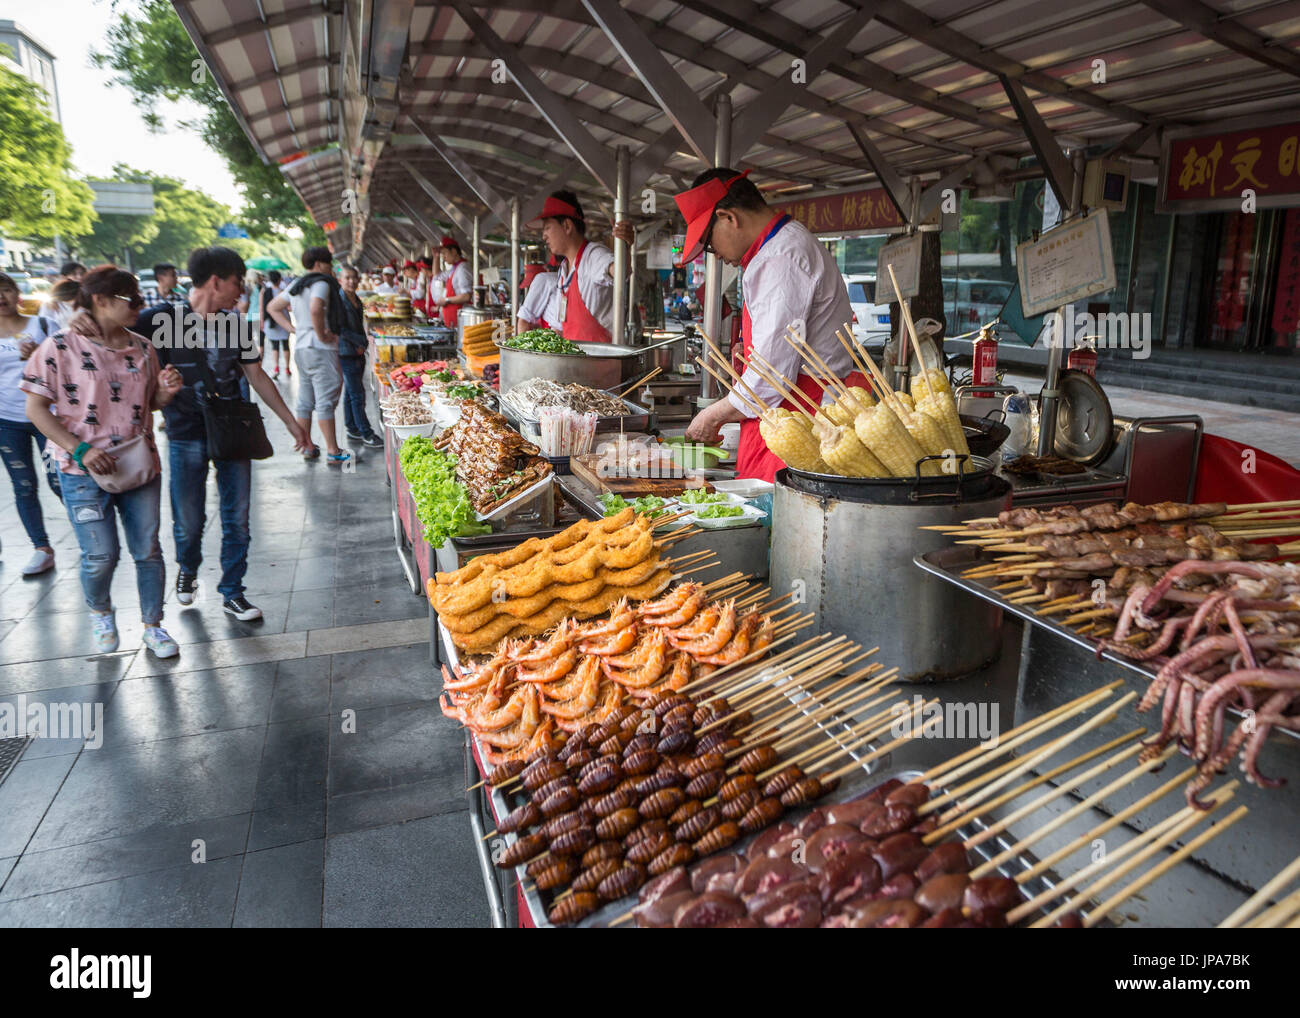 China, Beijing City, Wangfujing District, food market - Stock Image